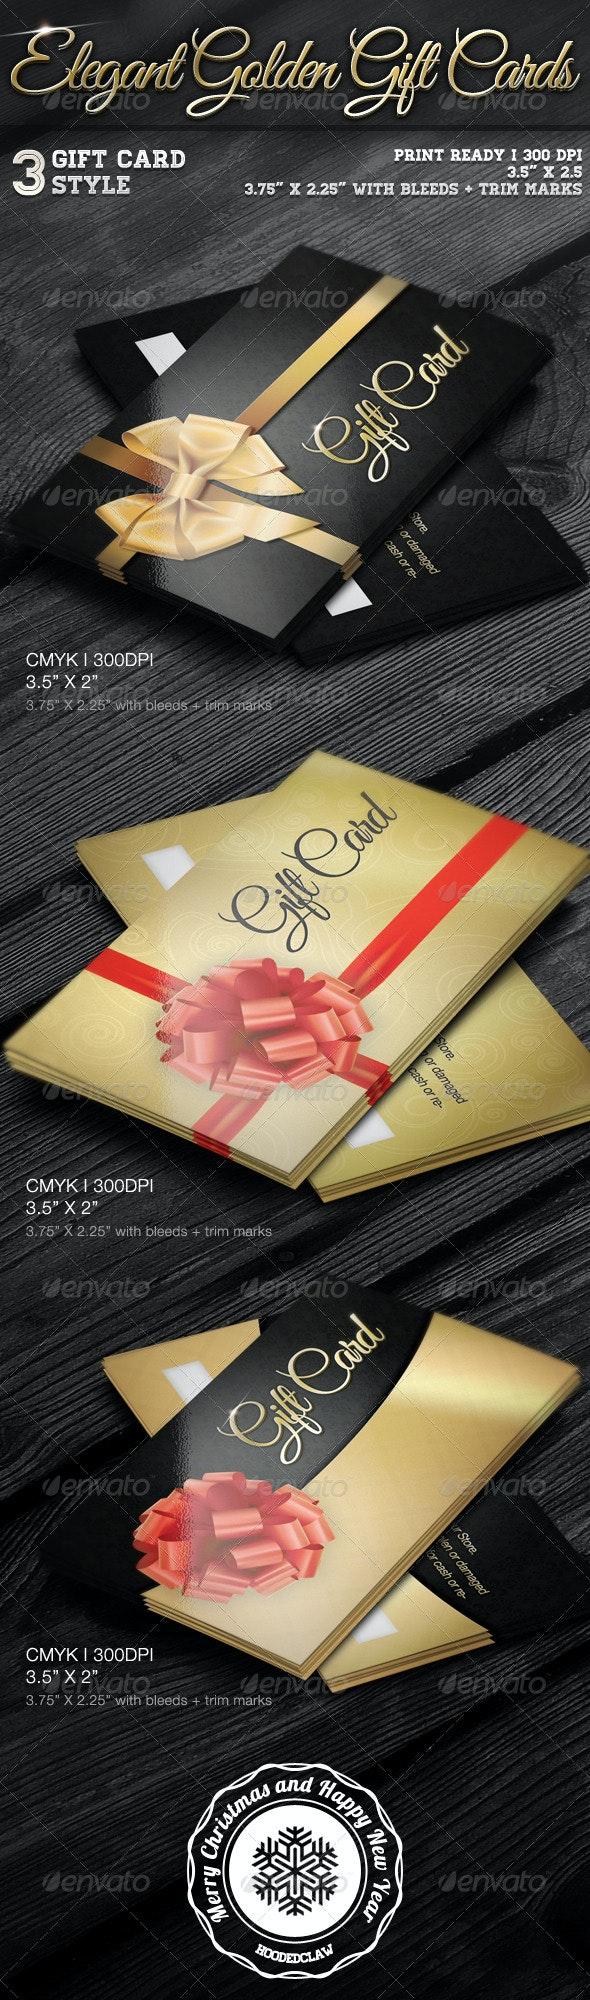 Elegant Golden Gift Cards - Loyalty Cards Cards & Invites